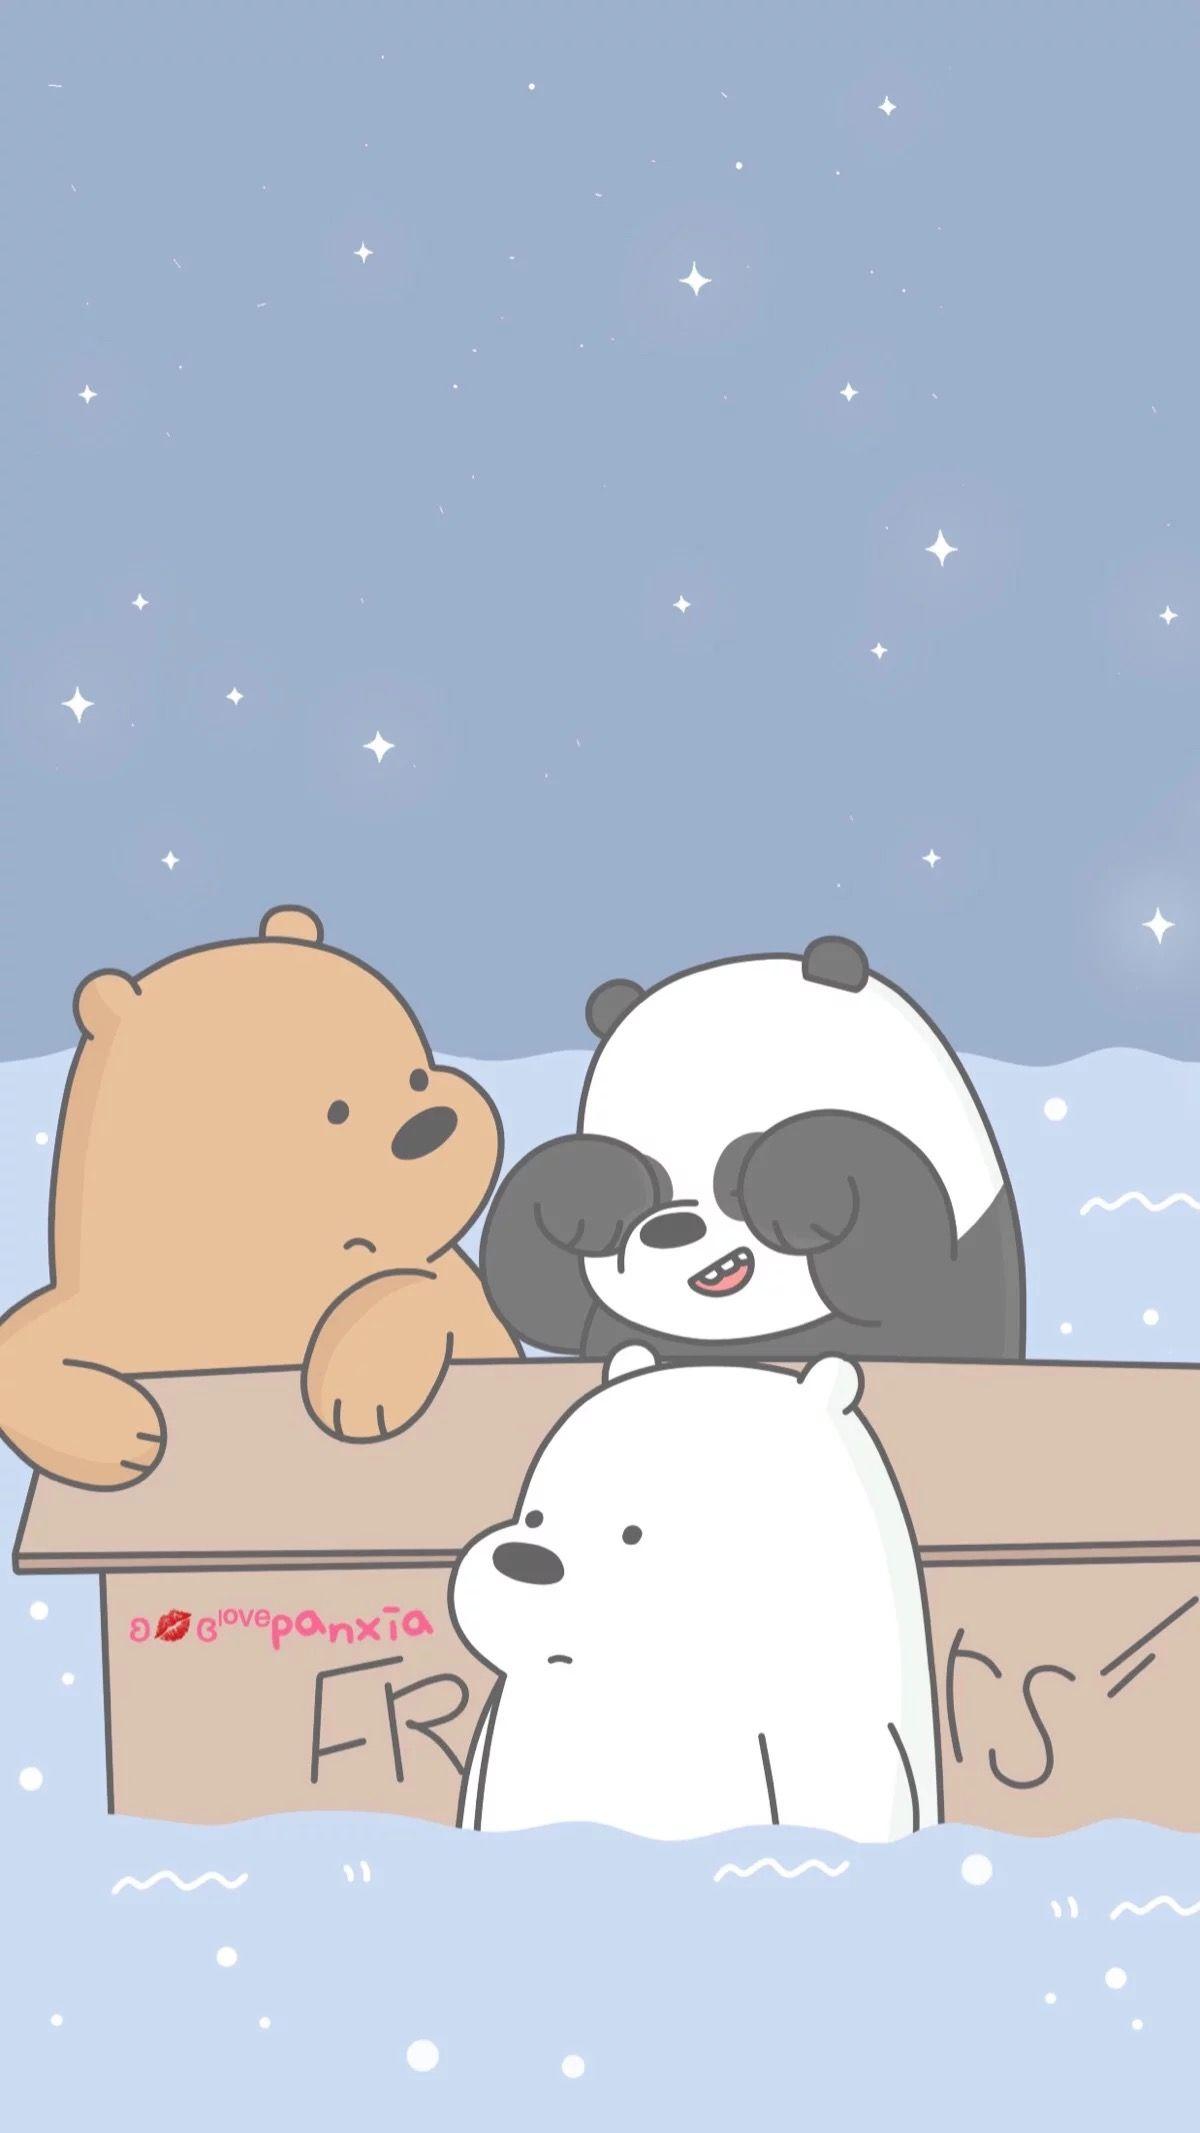 We Bear, Ice Bear We Bare Bears, Cute Wallpapers, We - We Bare